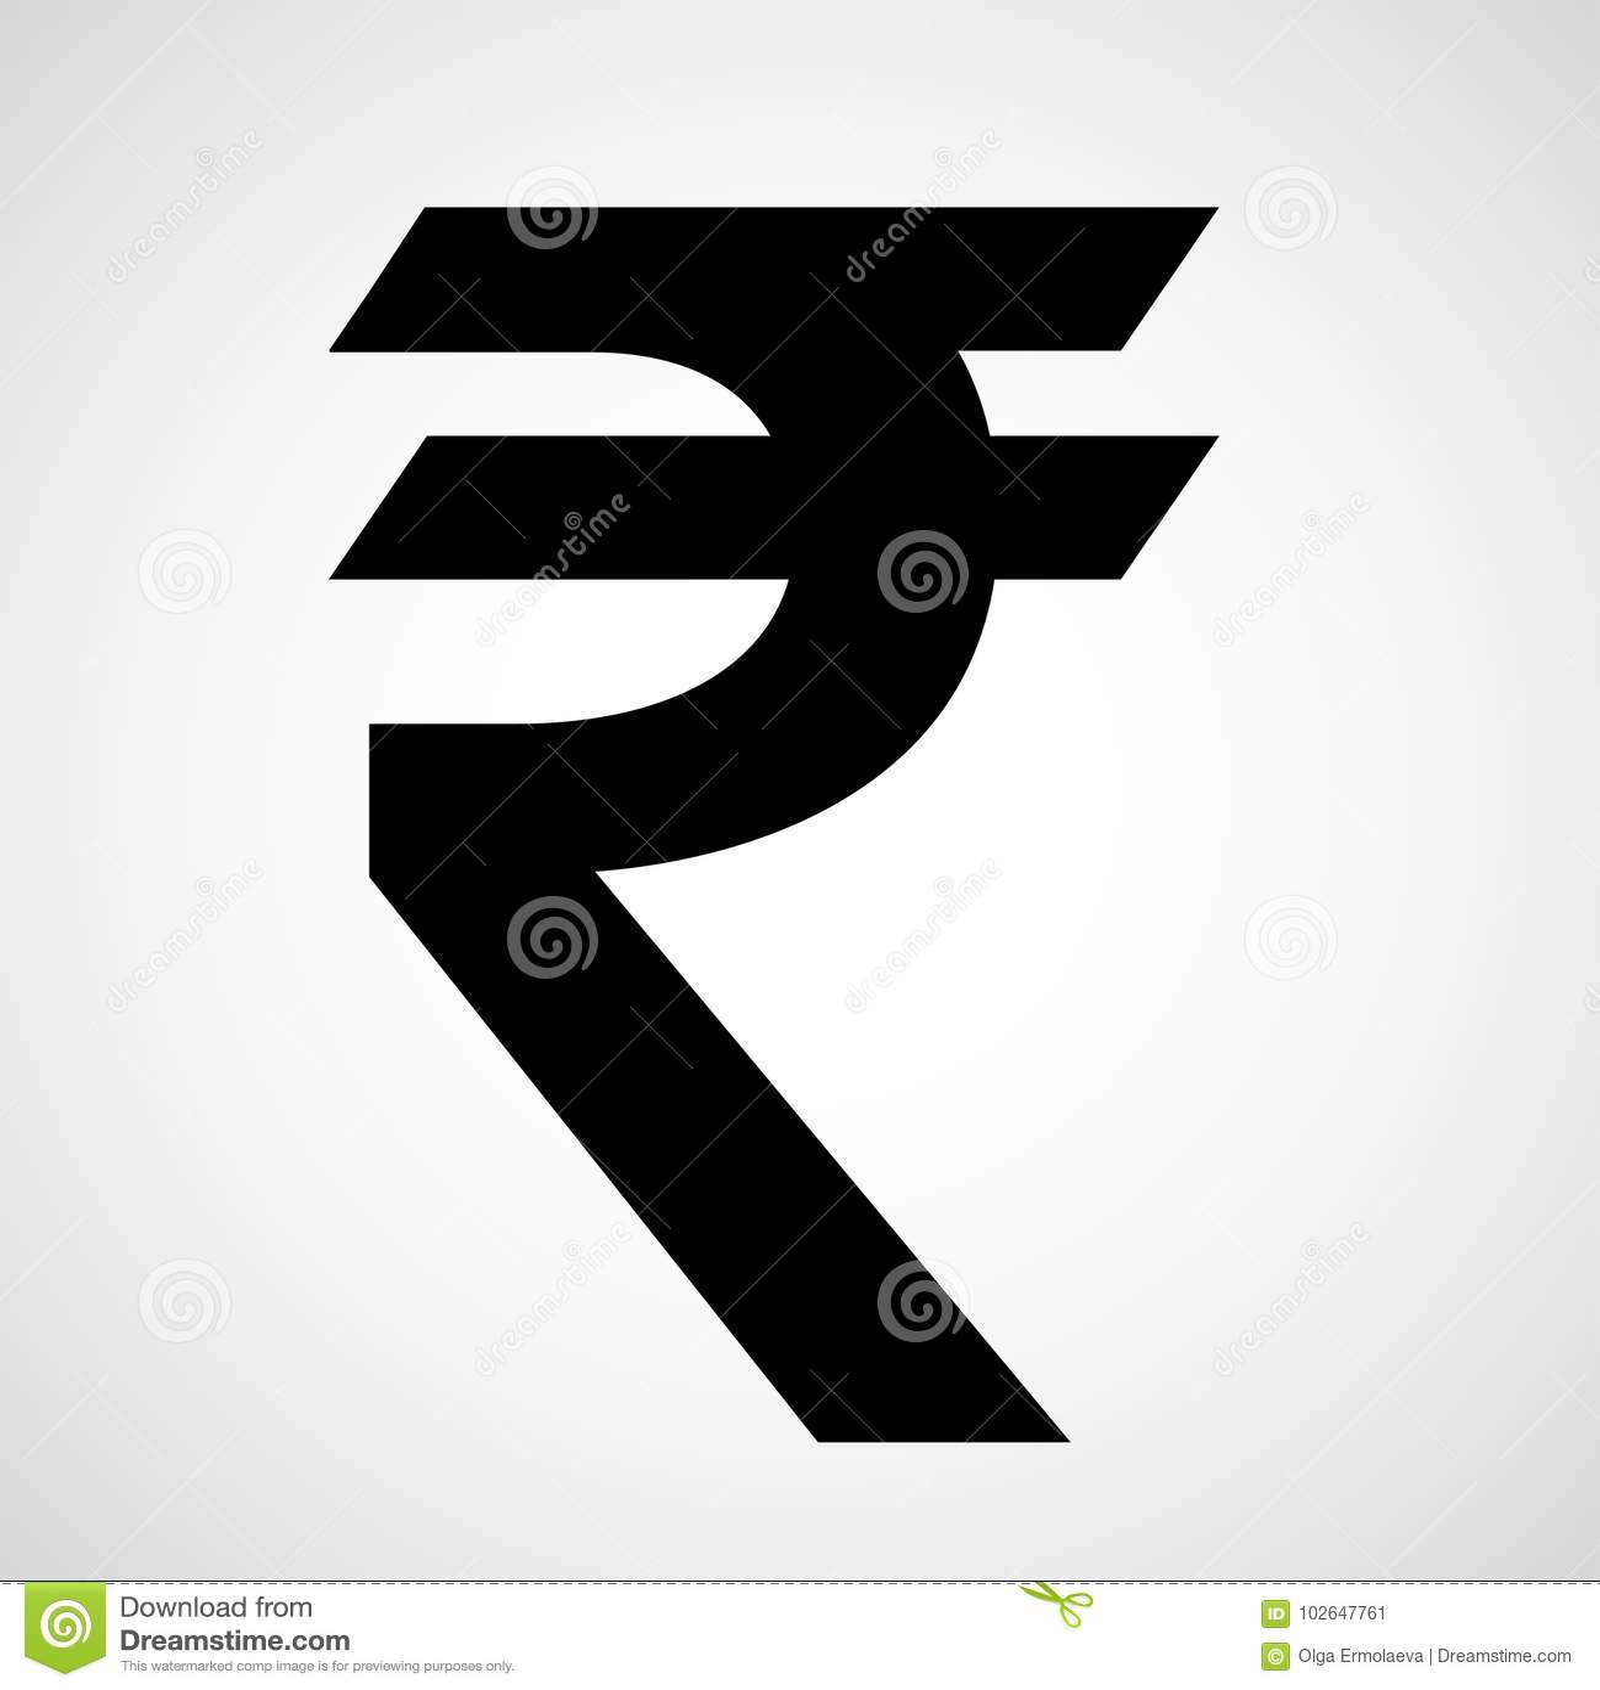 Indian Rupee Icon Stock Vector Illustration Of Economy 102647761